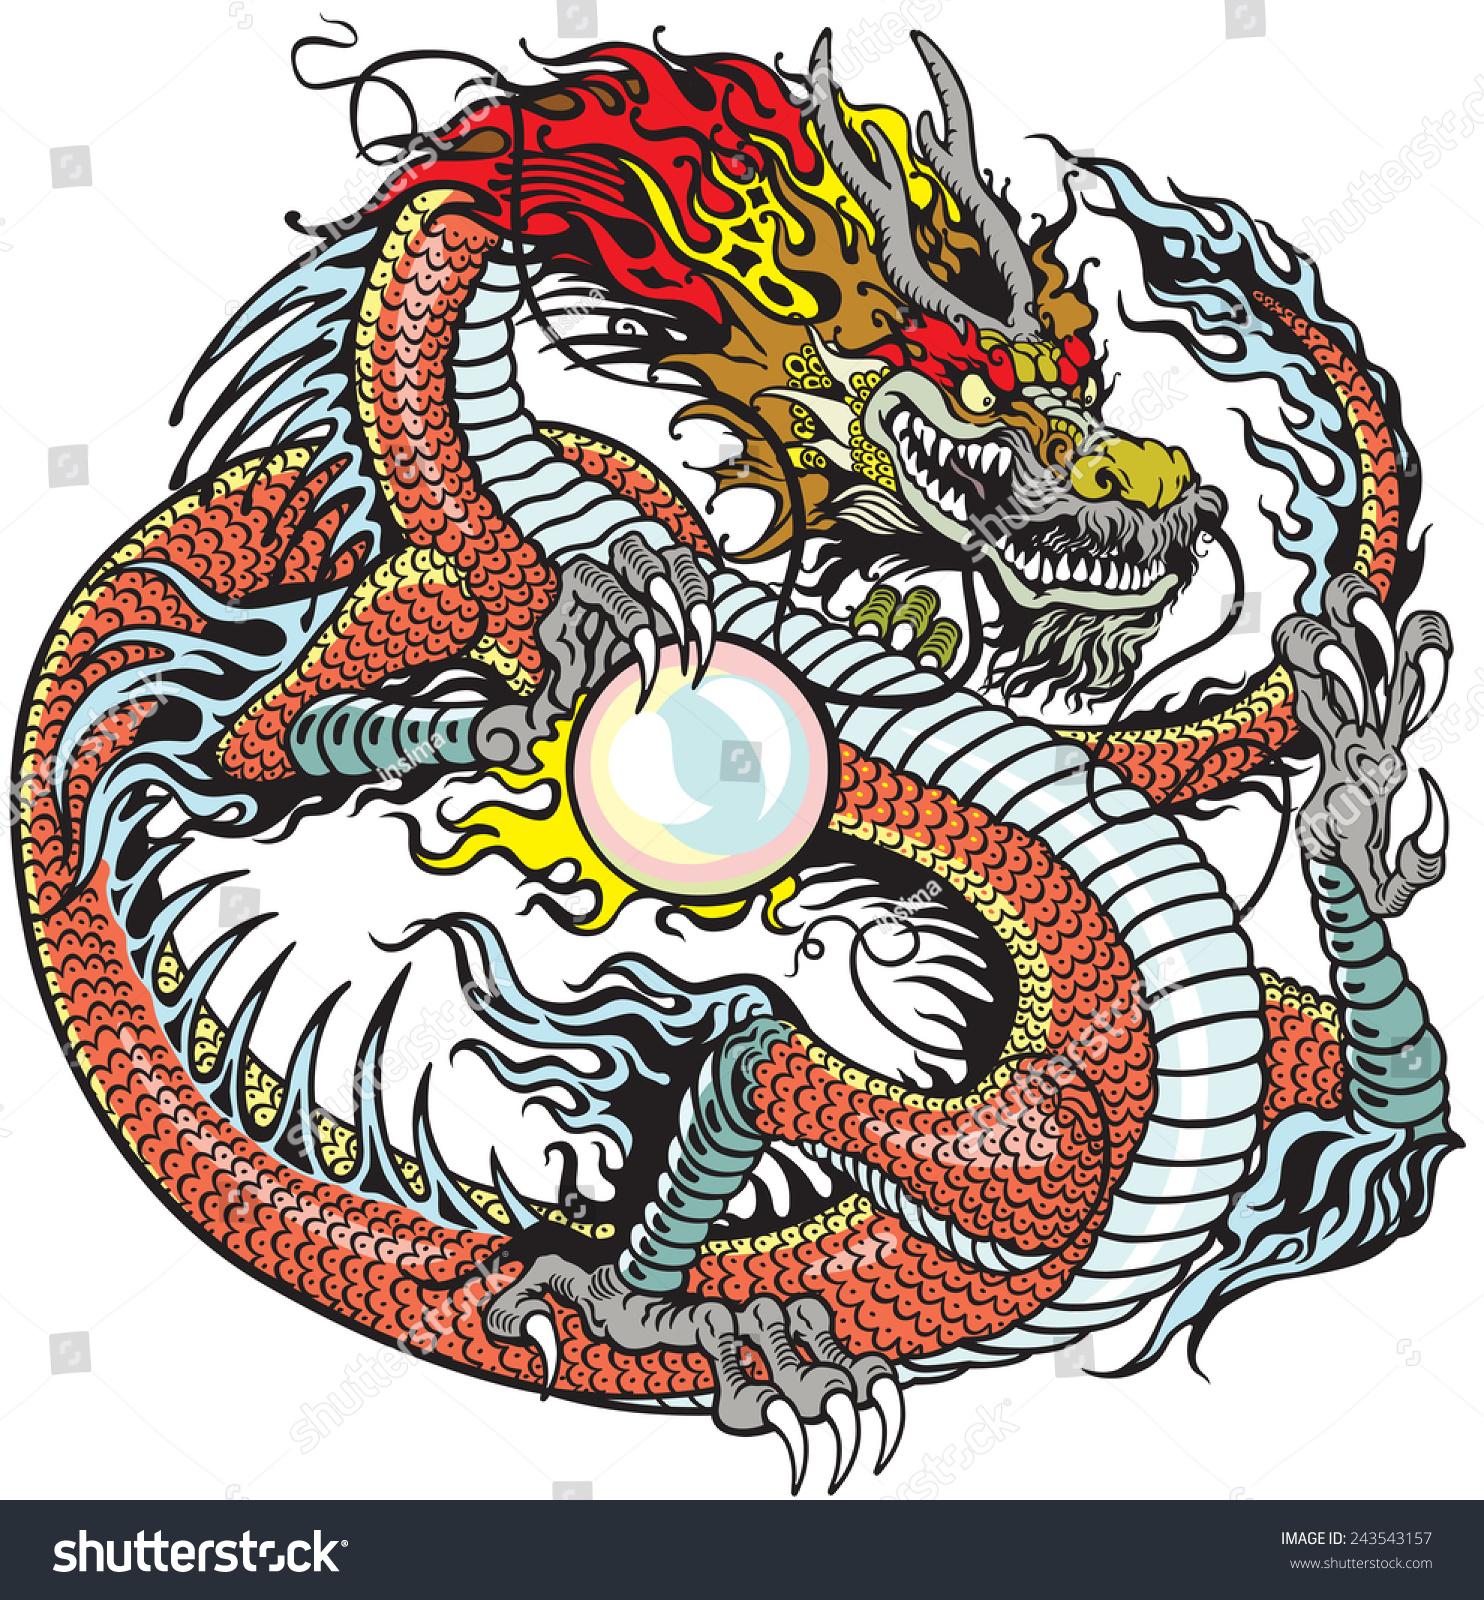 Asian Tattoos Illustrations: Chinese Dragon Holding Pearl Tattoo Illustration Stock